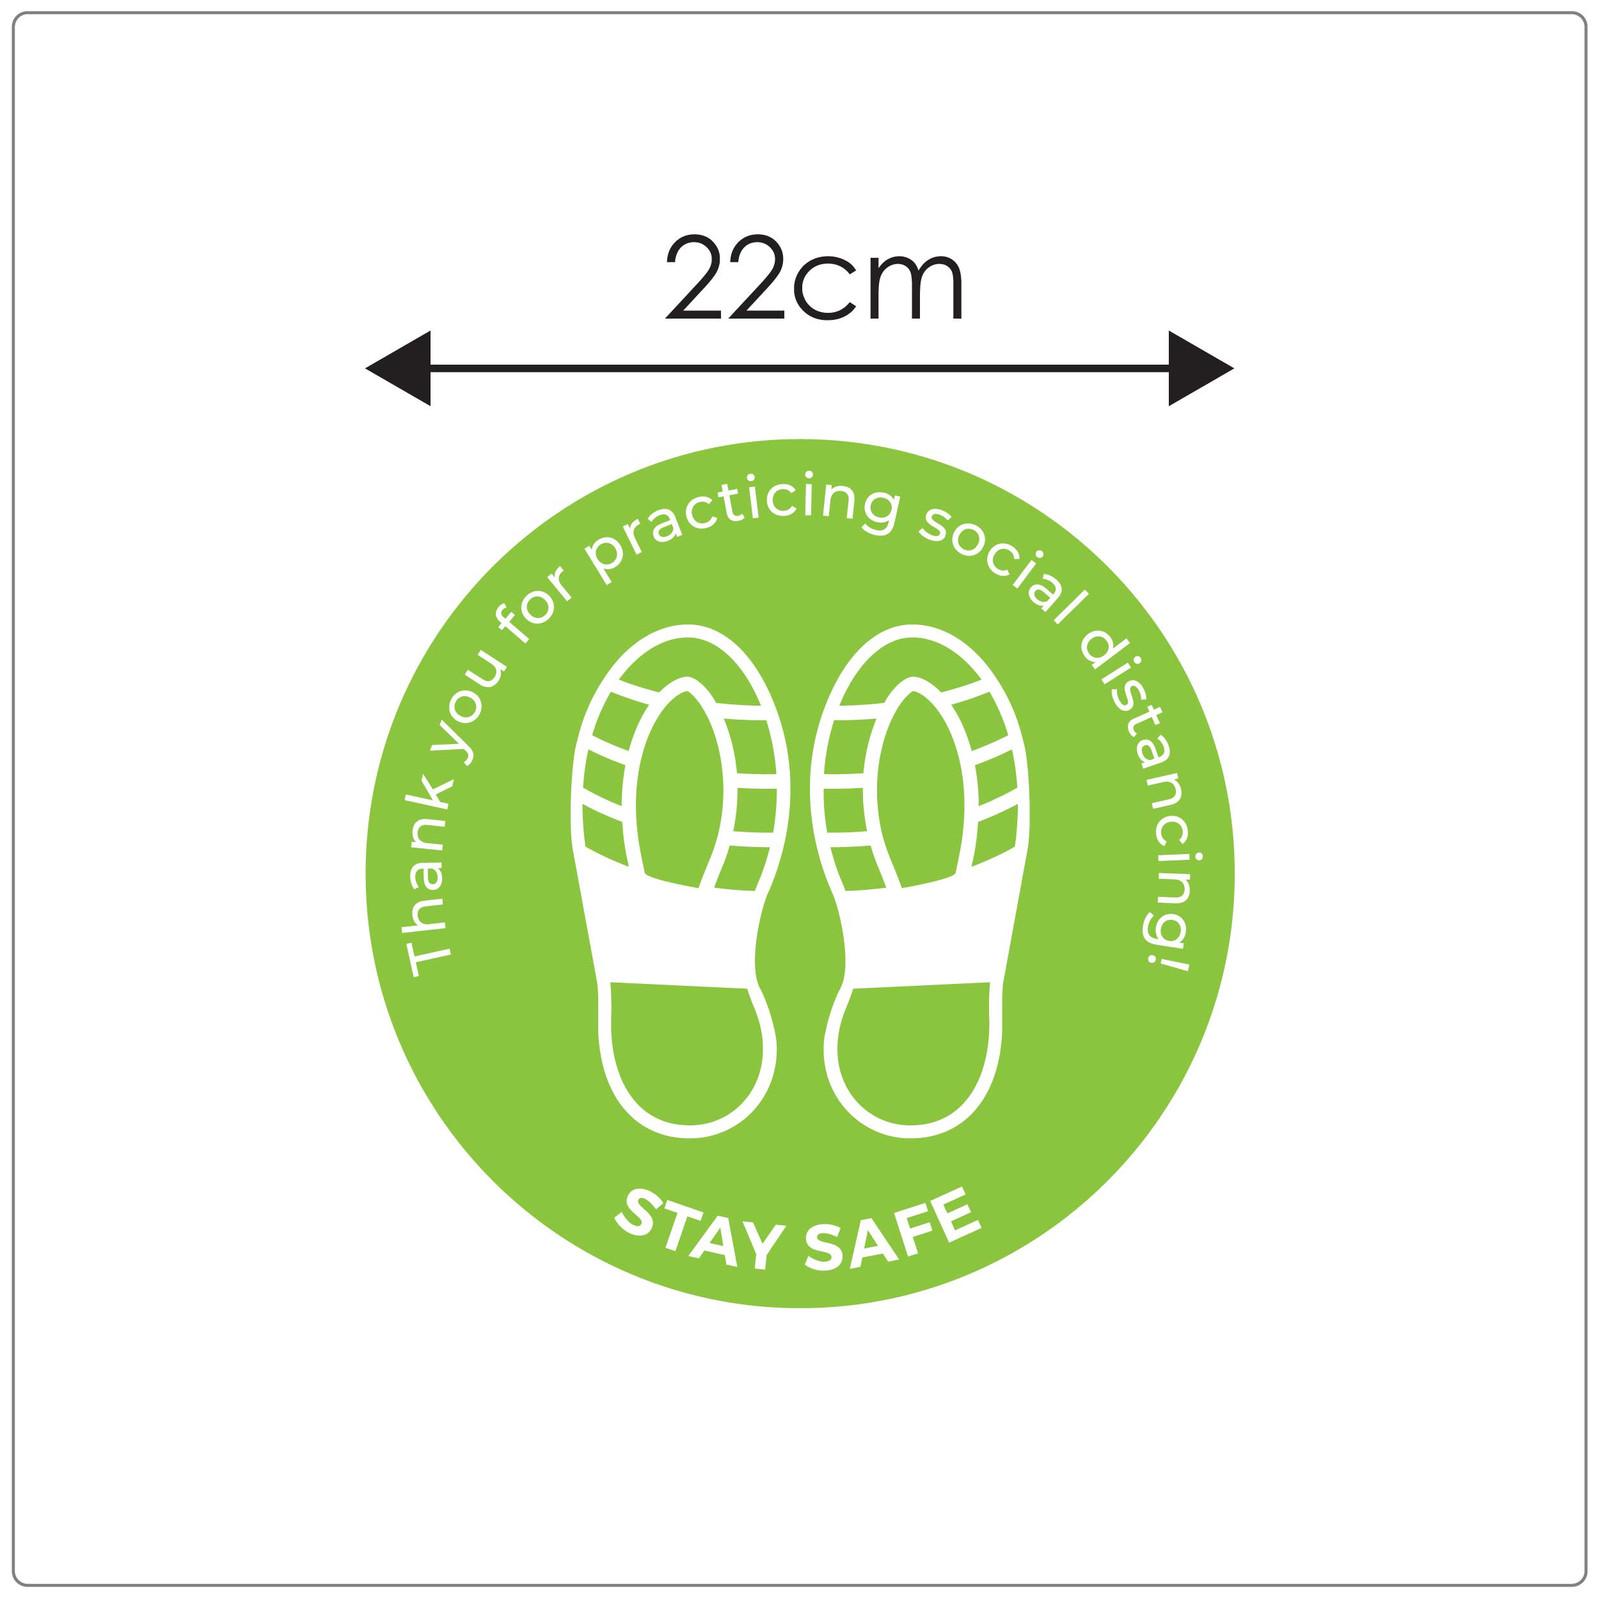 social distancing floor sticker for hard floors, sizing, green Self-adhesive Corona virus floor sticker to help social distancing.